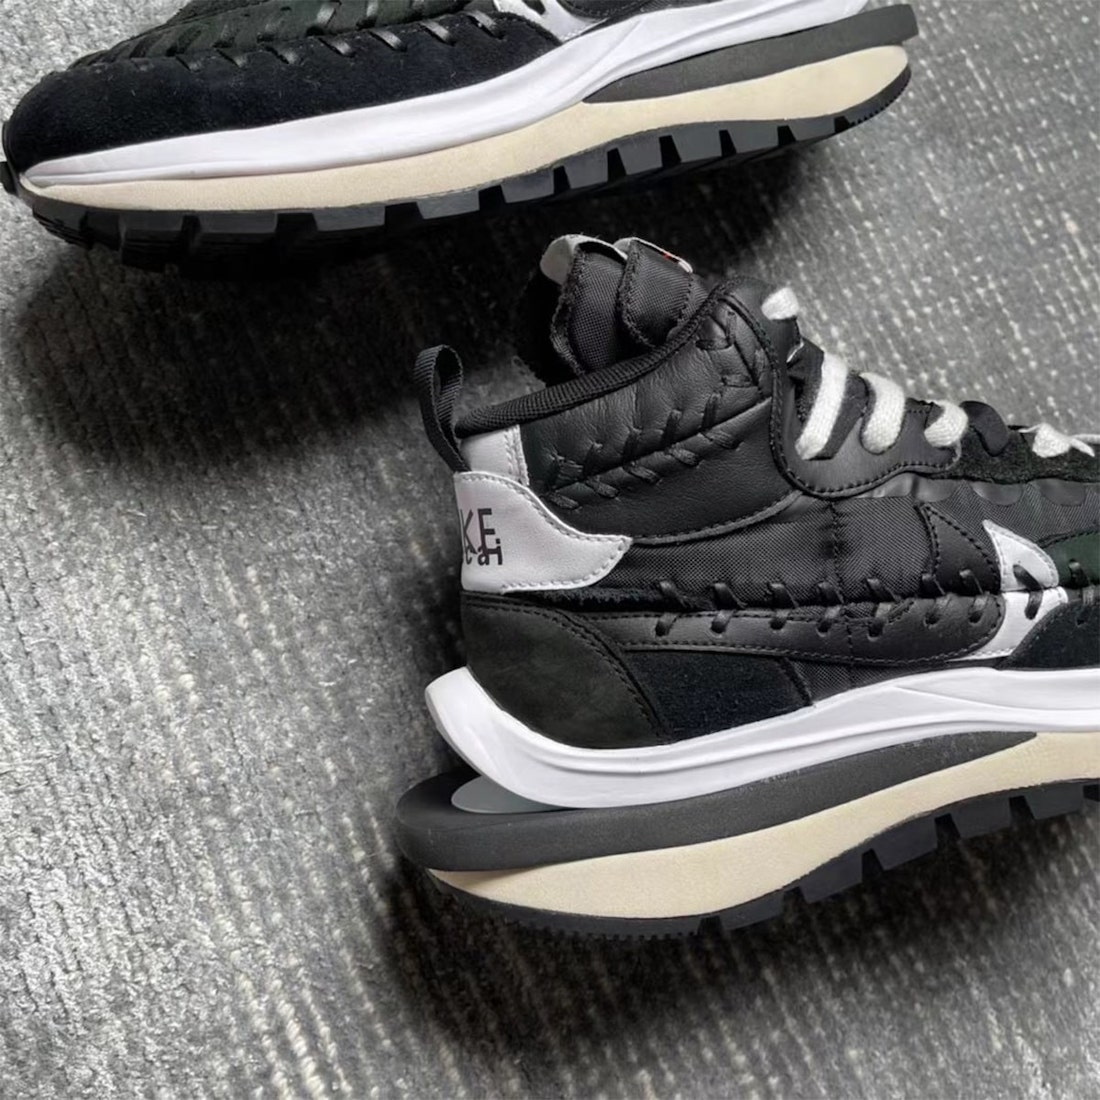 Sacai Jean Paul Gaultier Nike VaporWaffle Black White Release Date